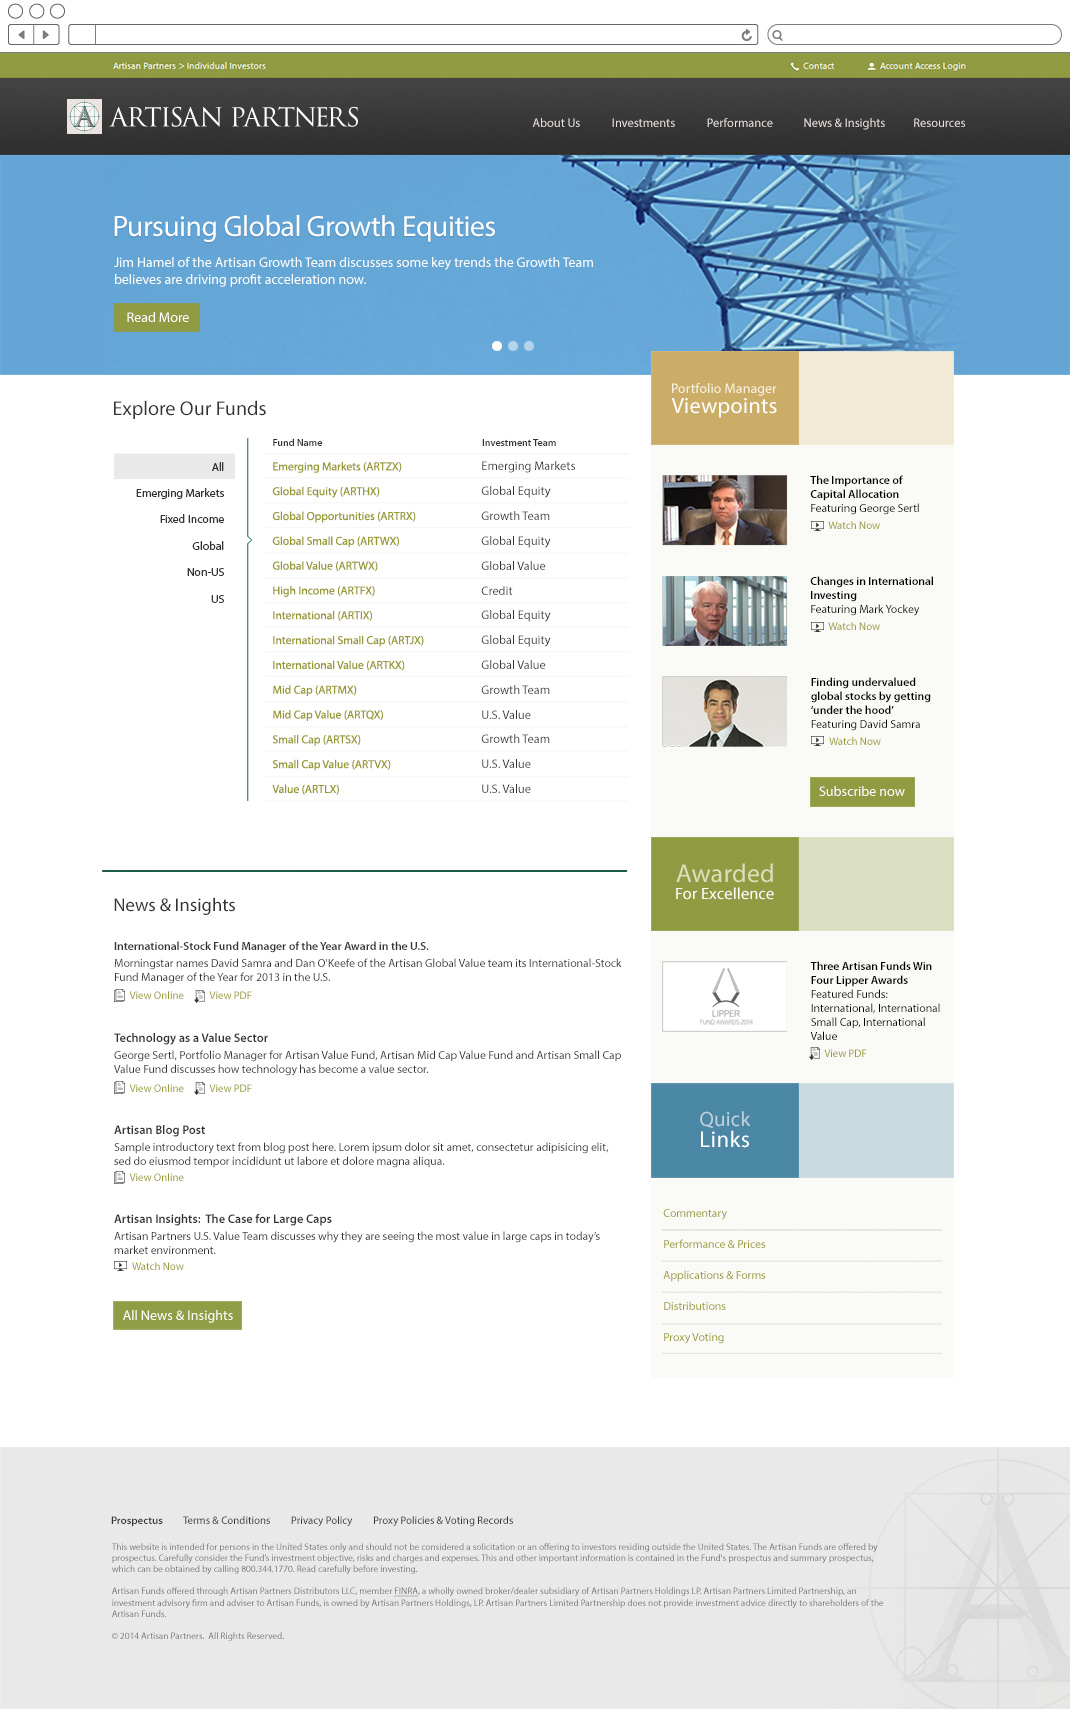 Artisan Partners home page